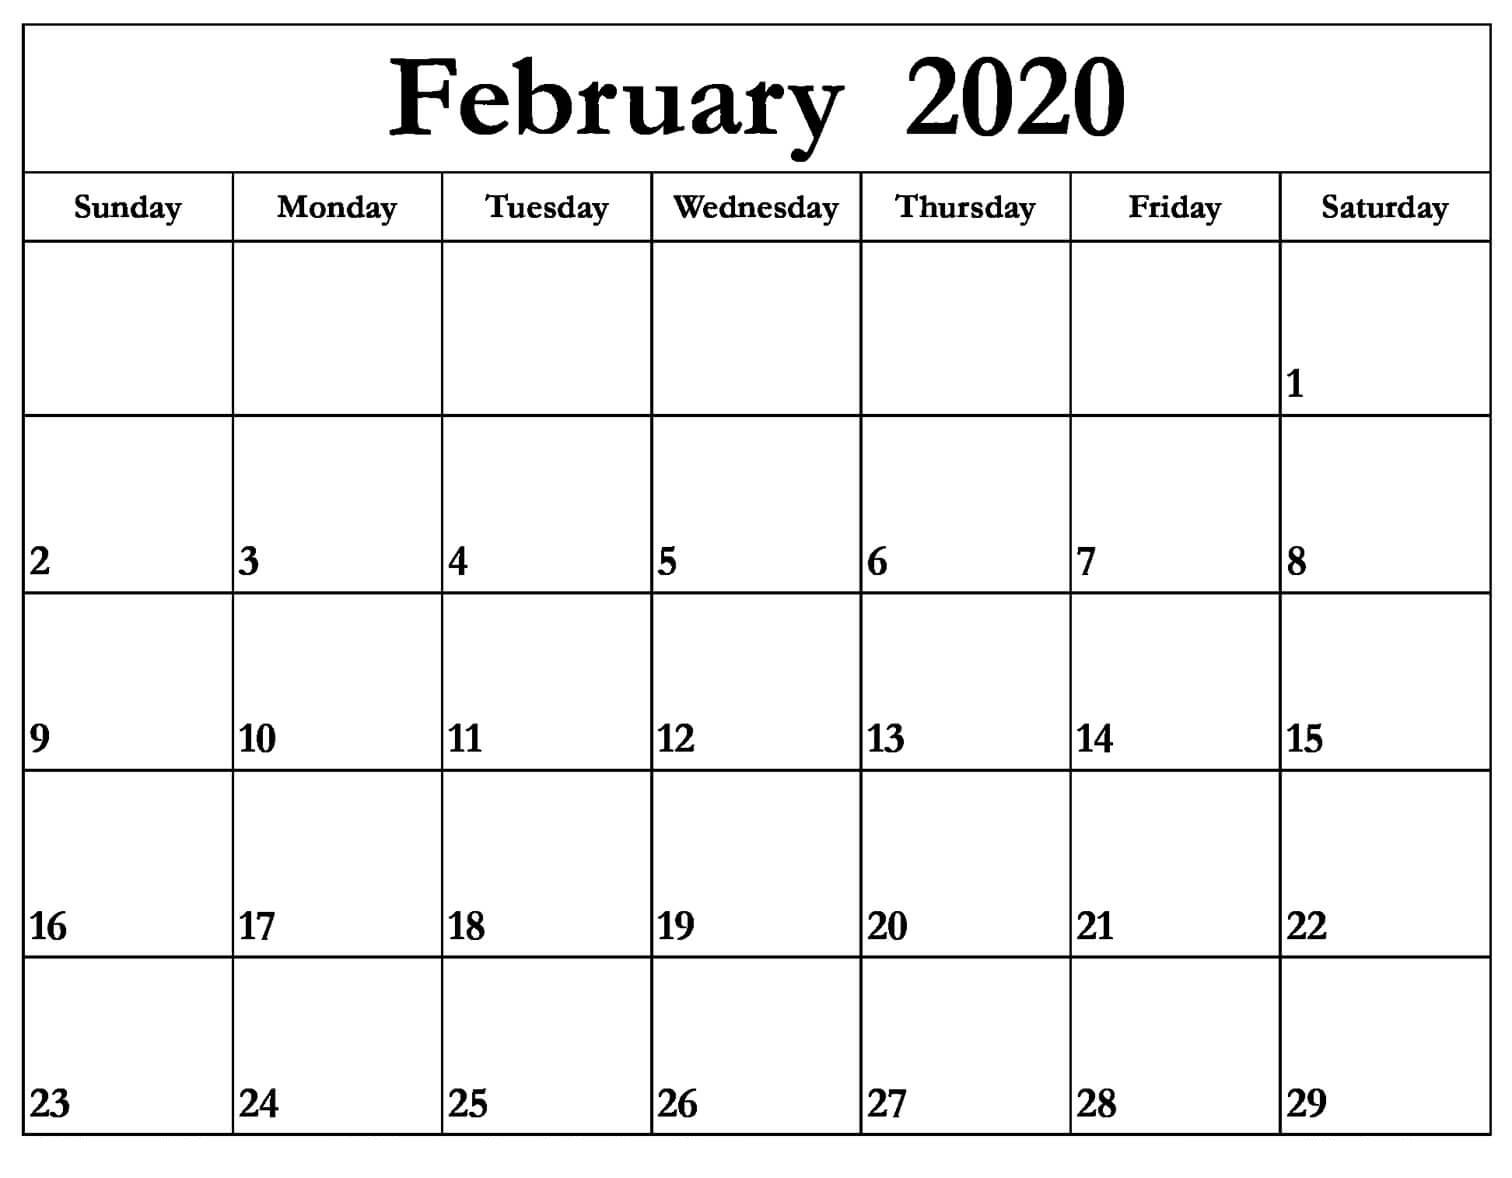 February 2020 Calendar Word Excel & Pdf | 12 Month Printable